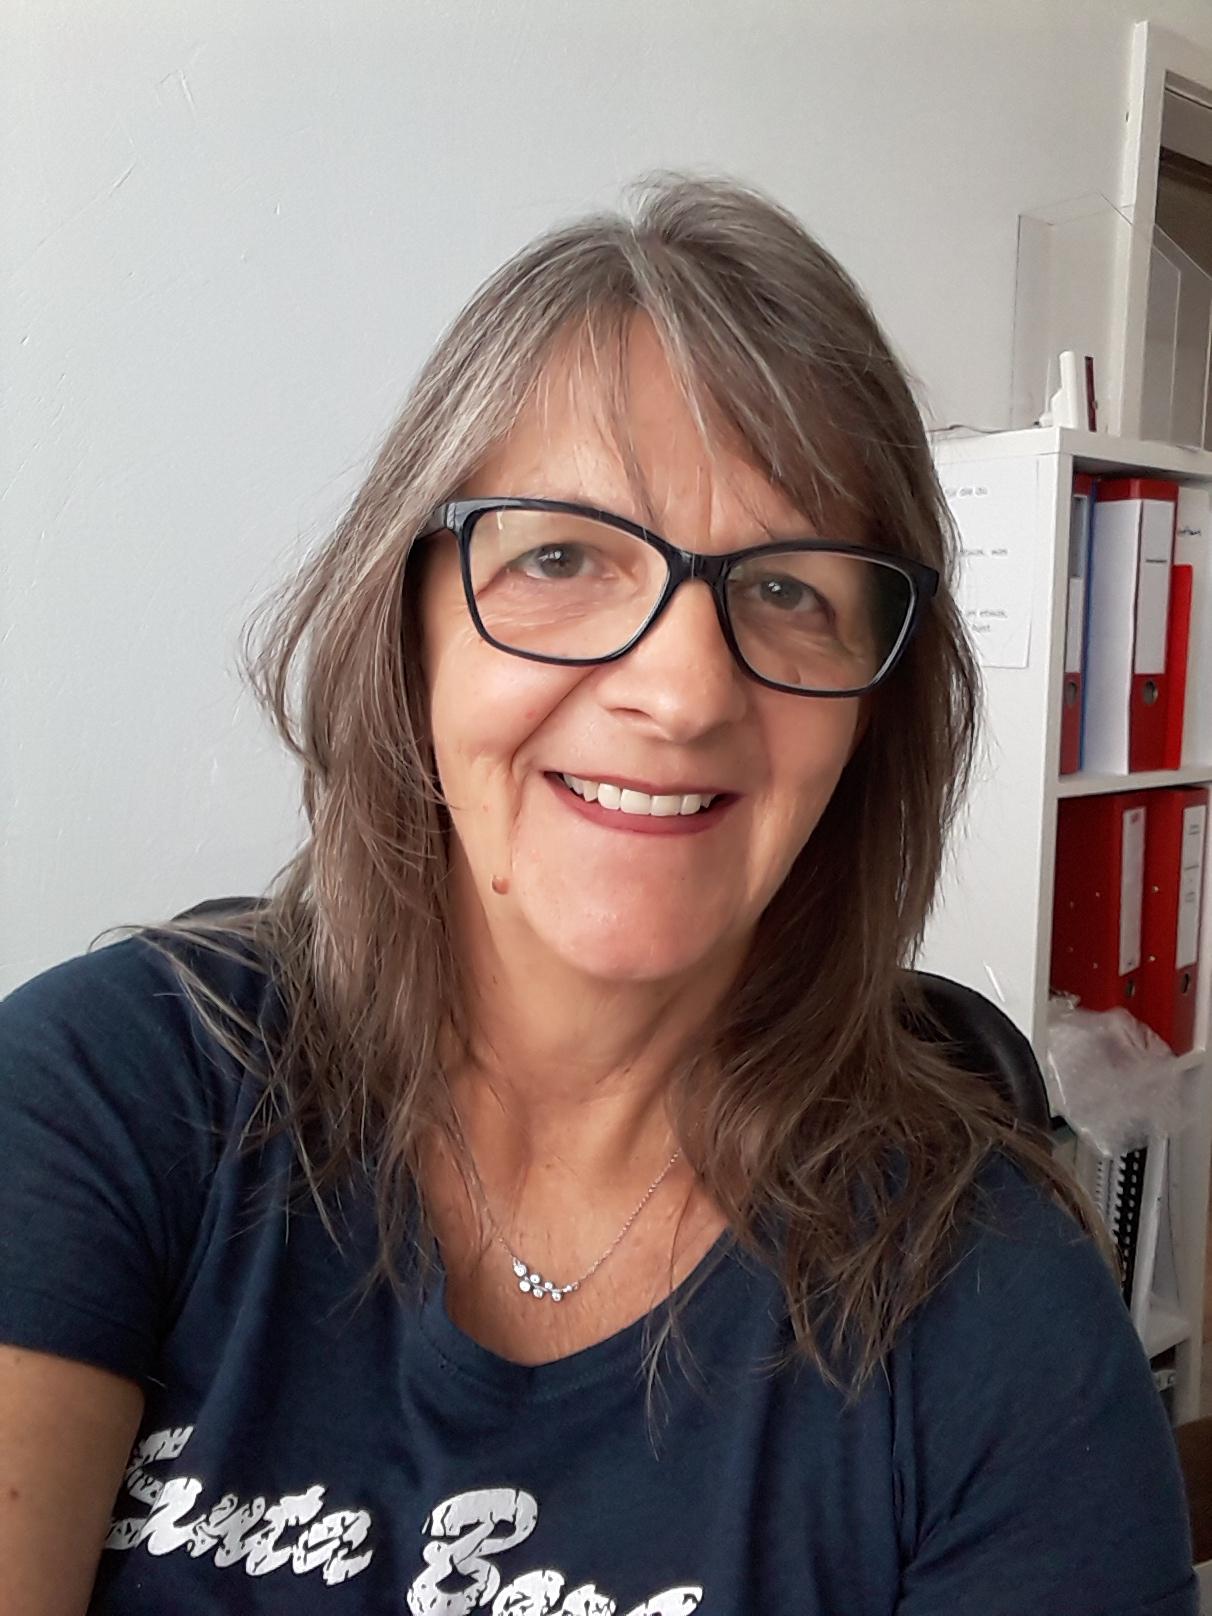 Barbara Rheinbold